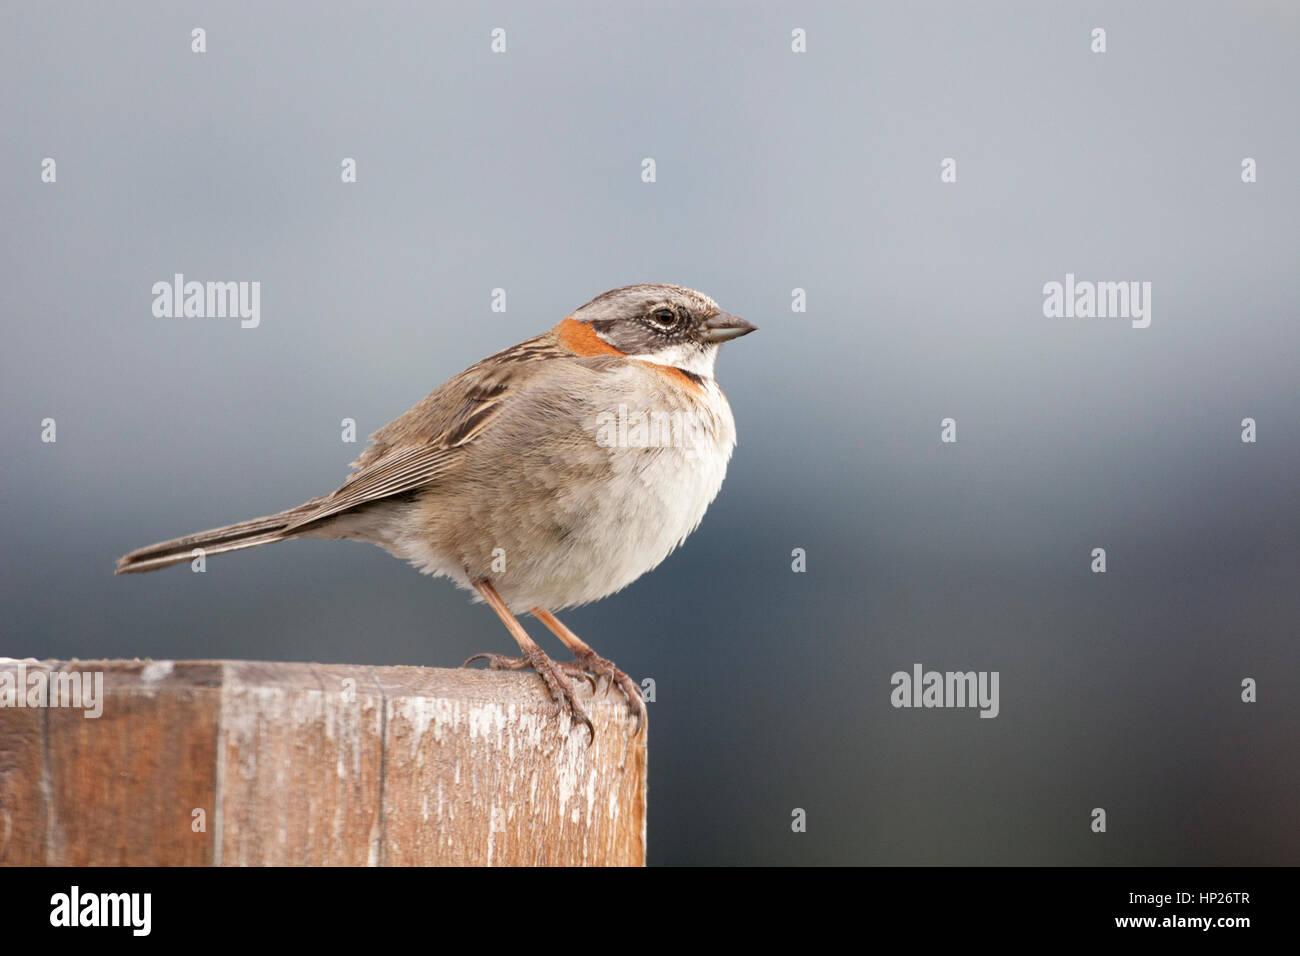 Rufous-collared Sparrow (Zonotrichia capensis australis) at Lago Pehoe Stock Photo